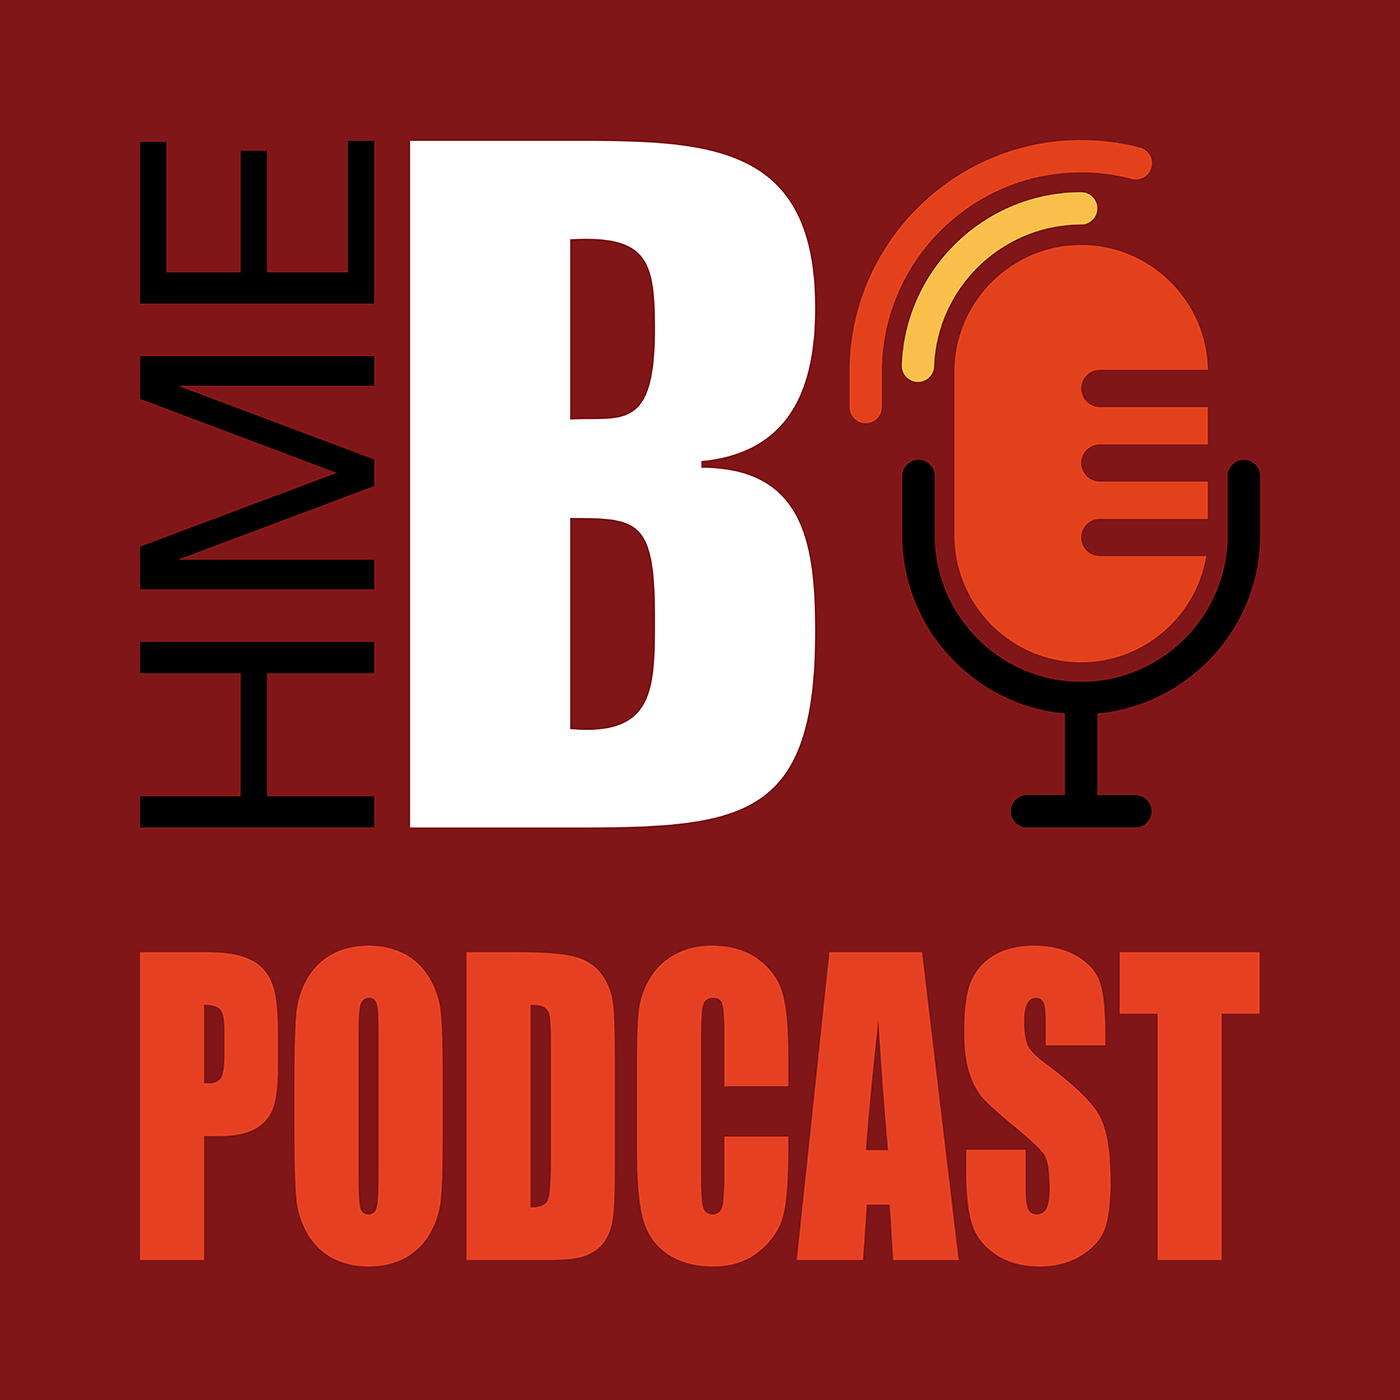 HME Business Podcast show art